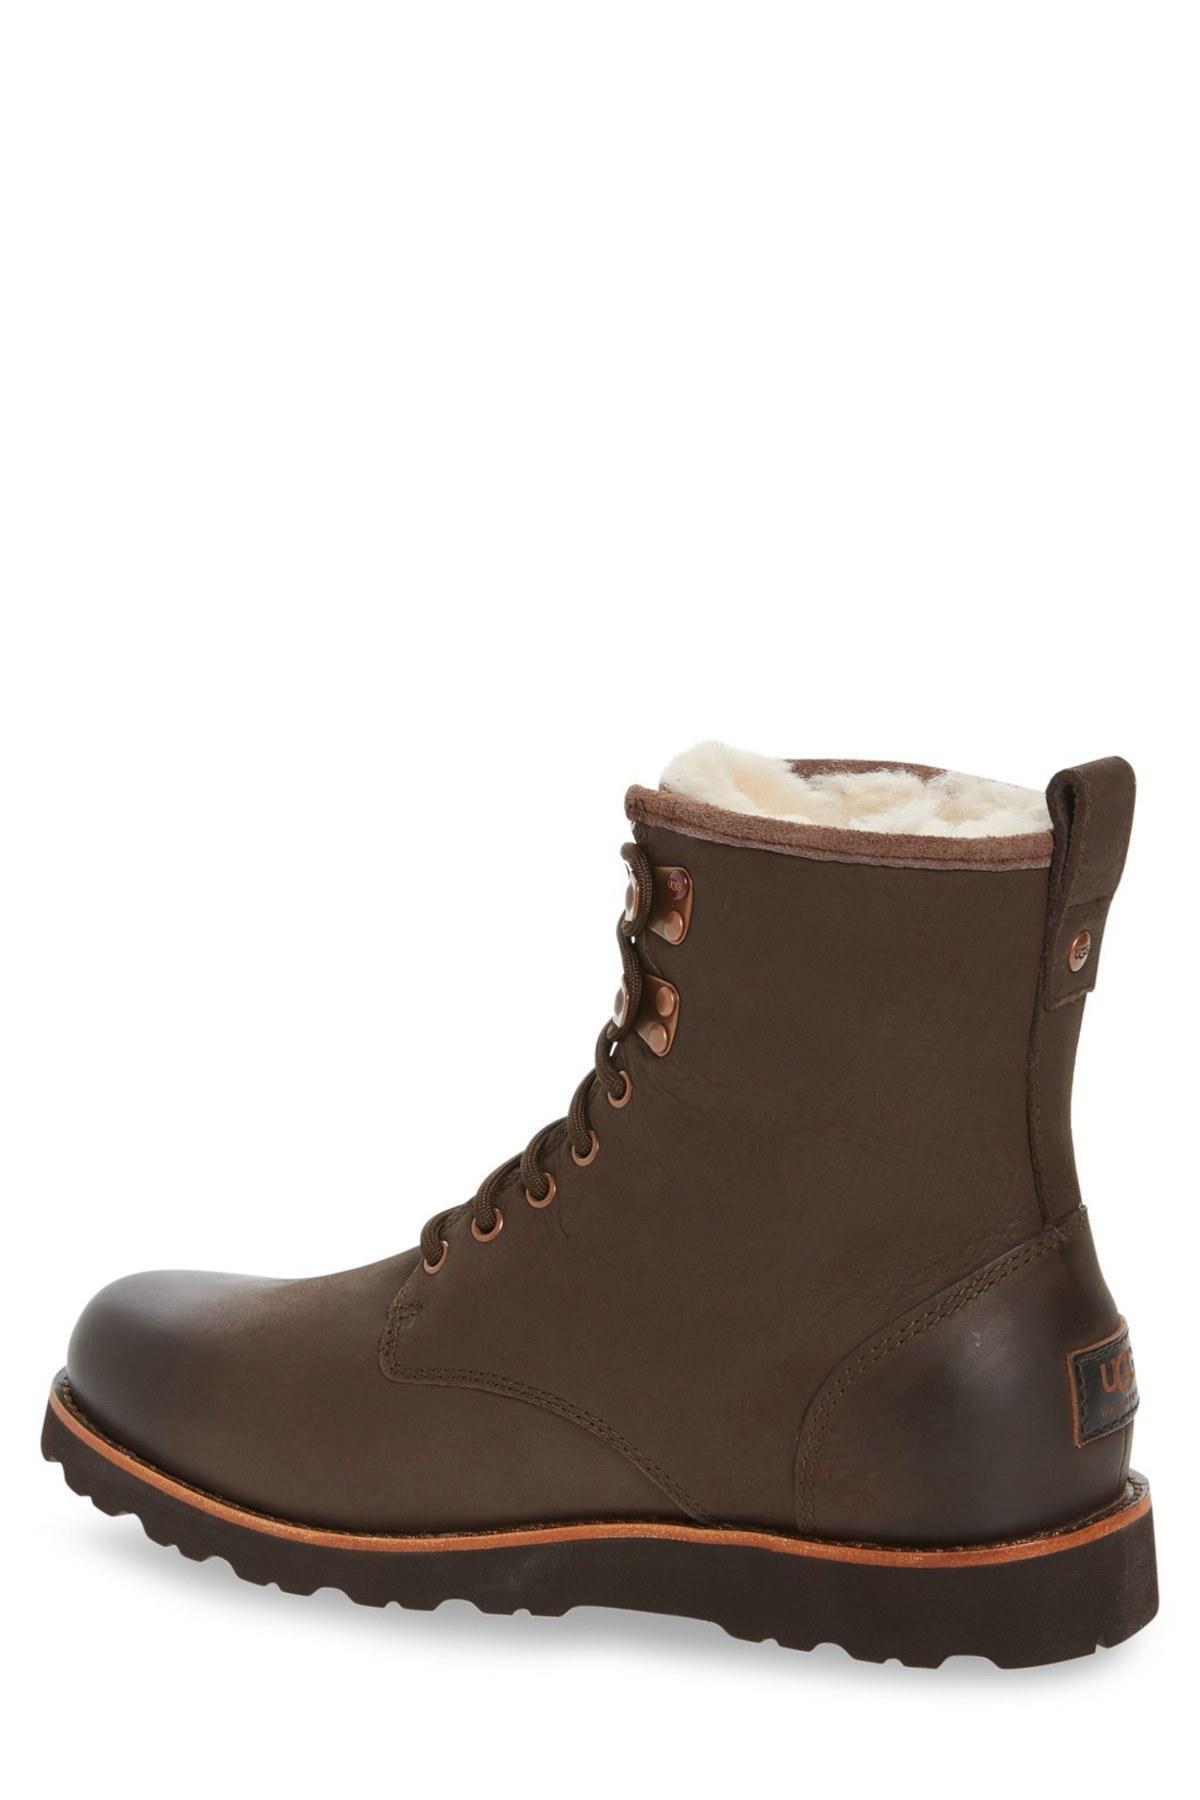 UGG Leather Hannen Plain Toe Genuine